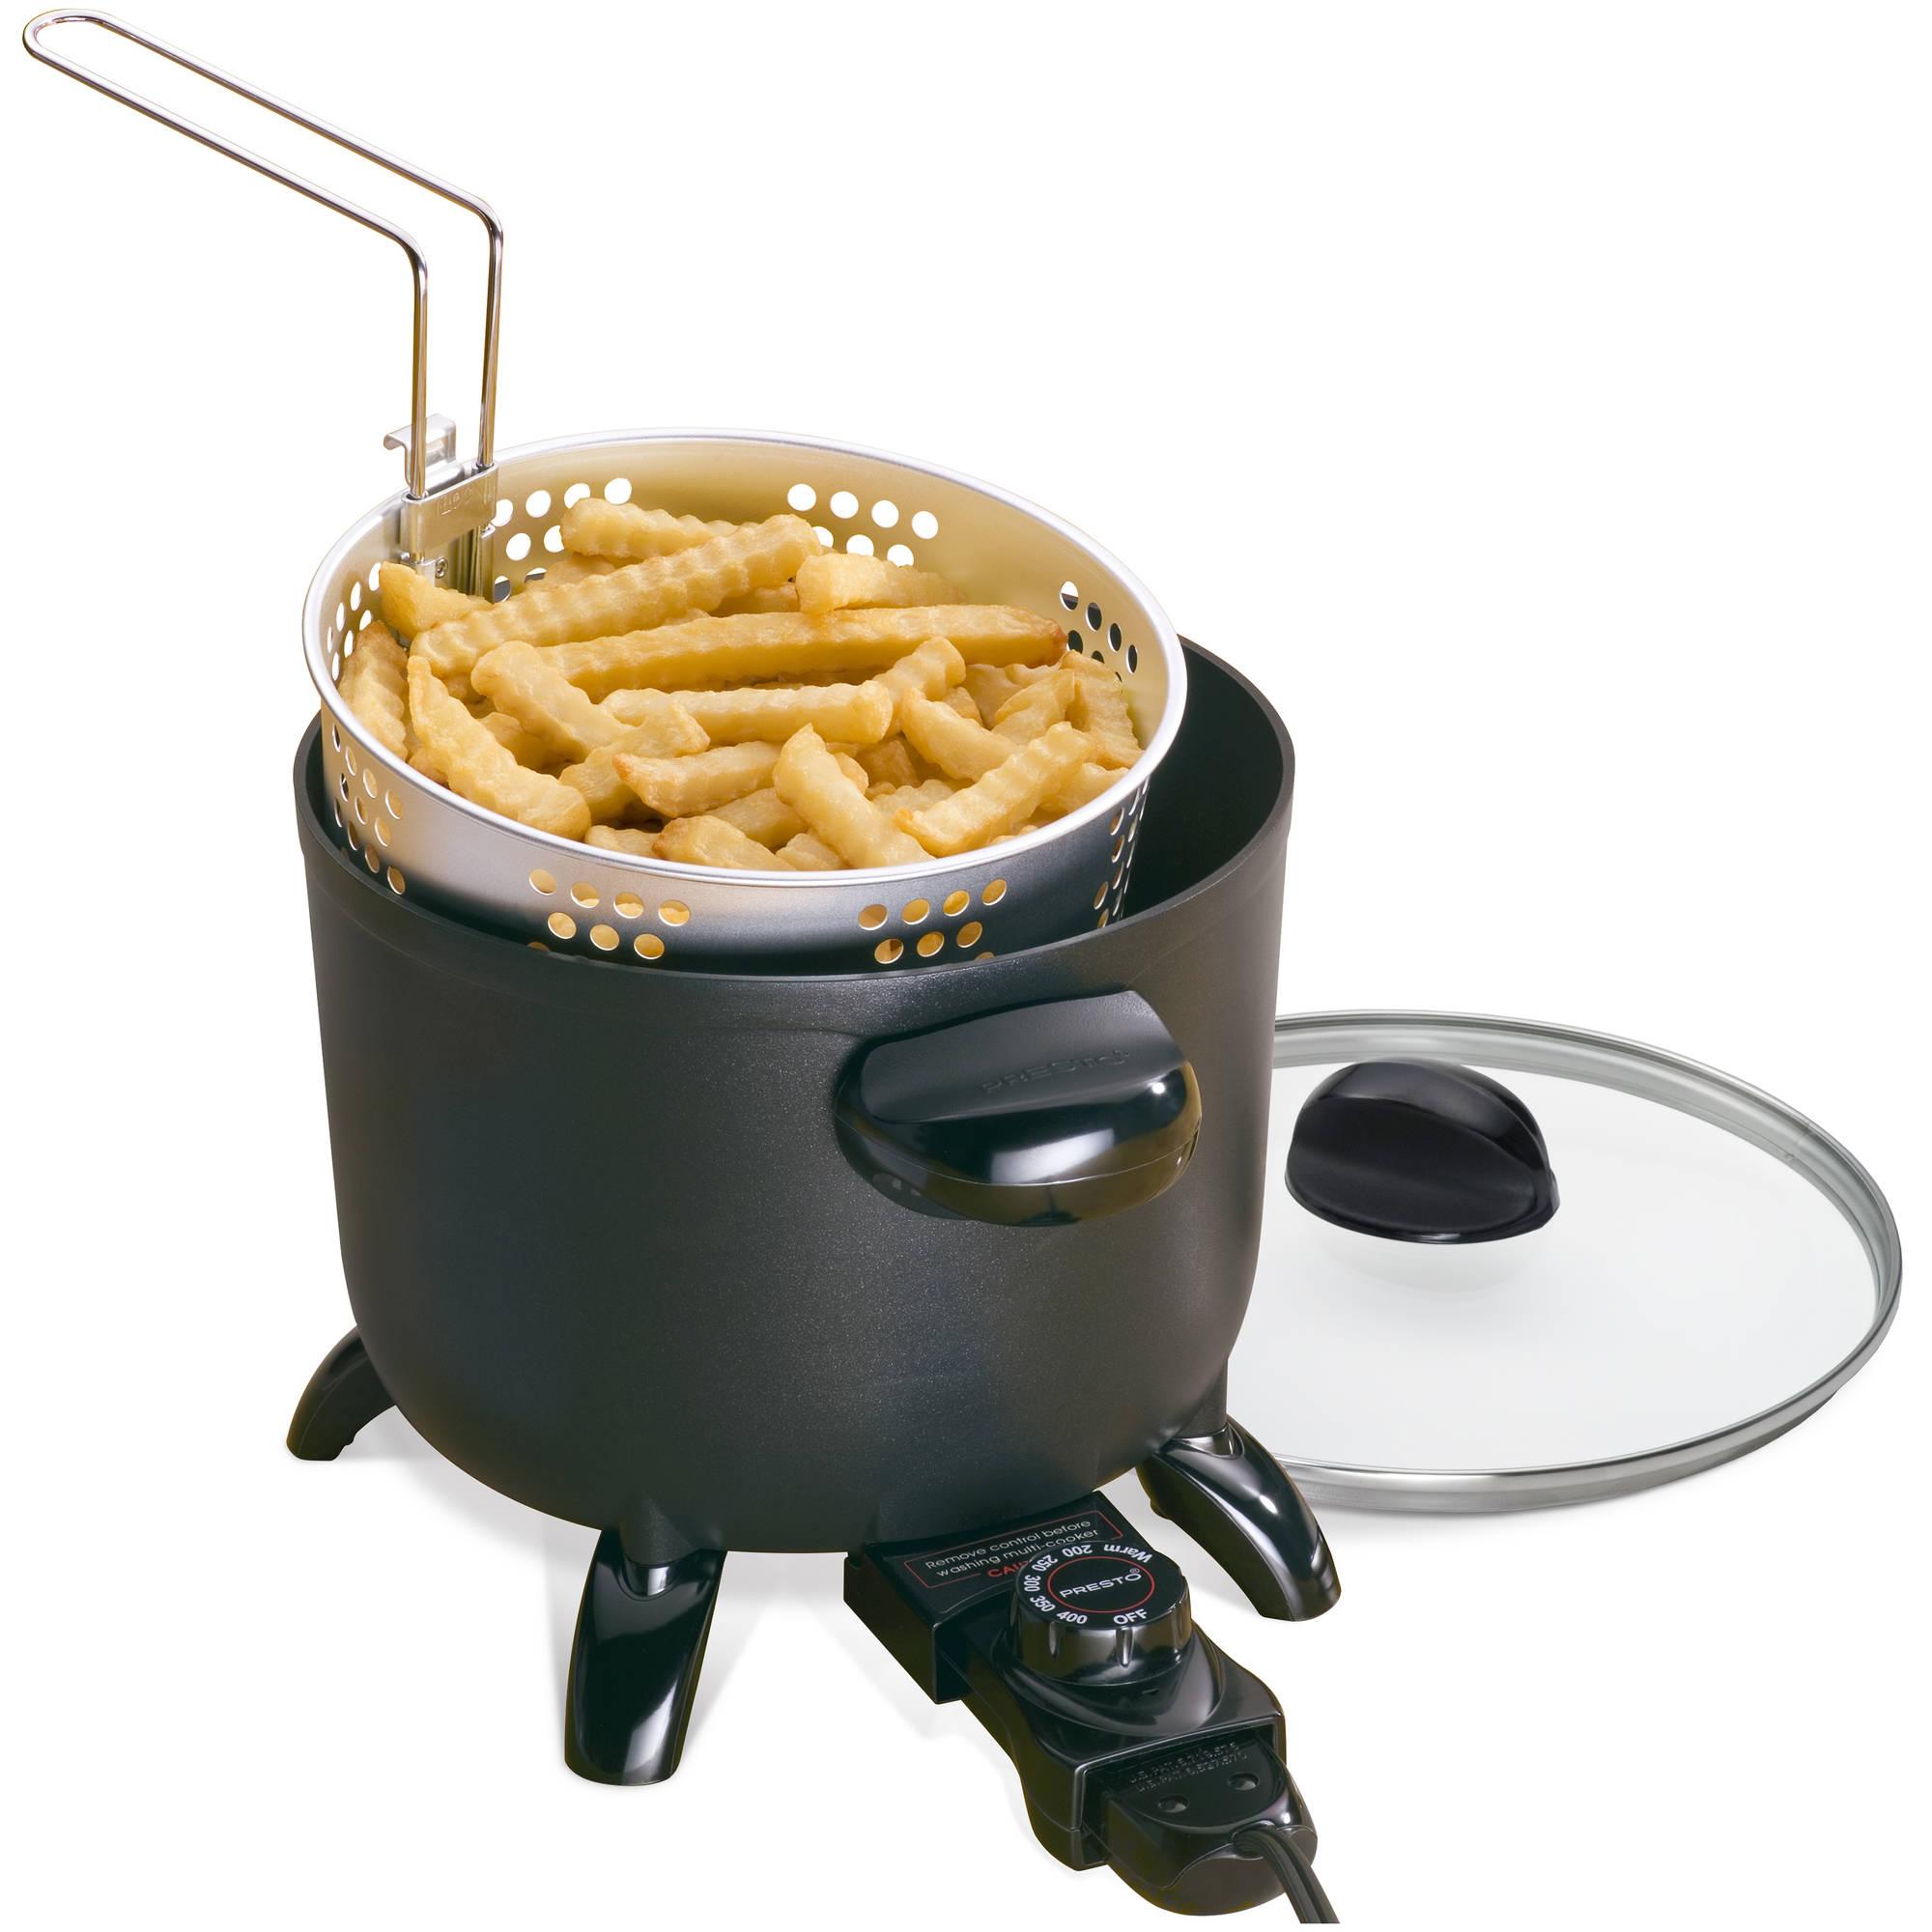 Presto Kitchen Kettle Multi-Cooker Steamer